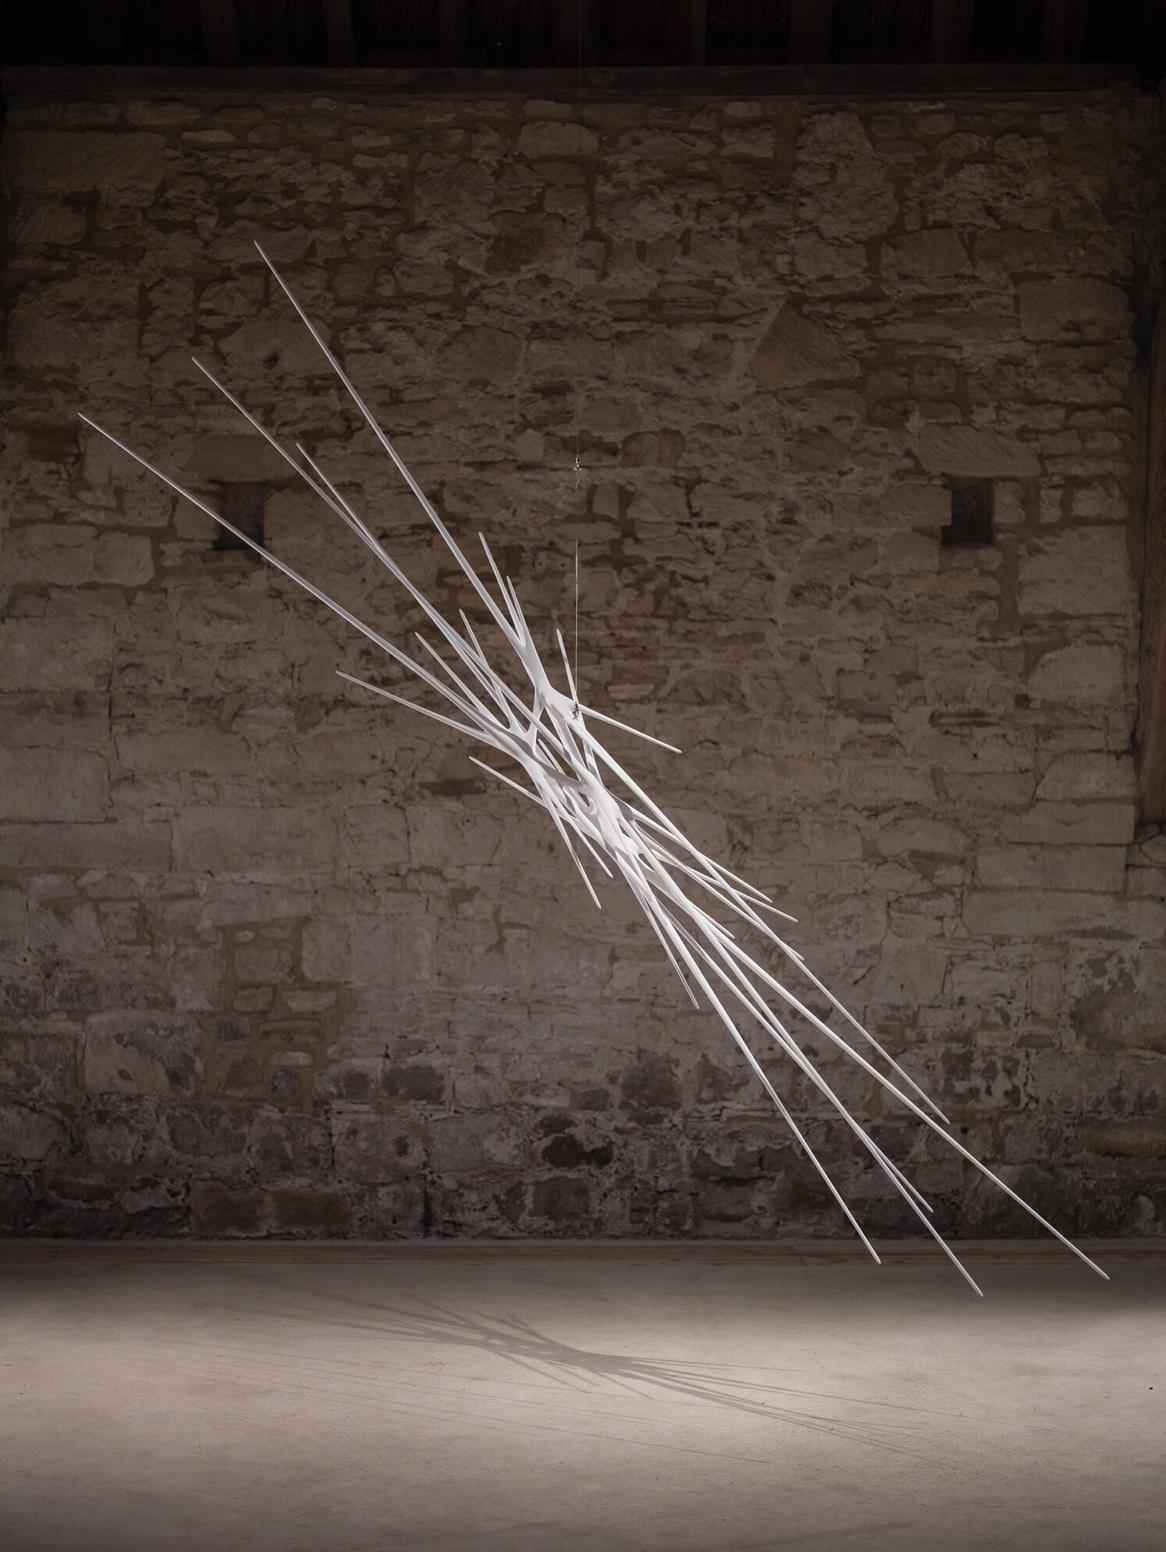 Artist Christopher Kurtz created this sculpture titled Wiltshire Meridian 40919, 2019.